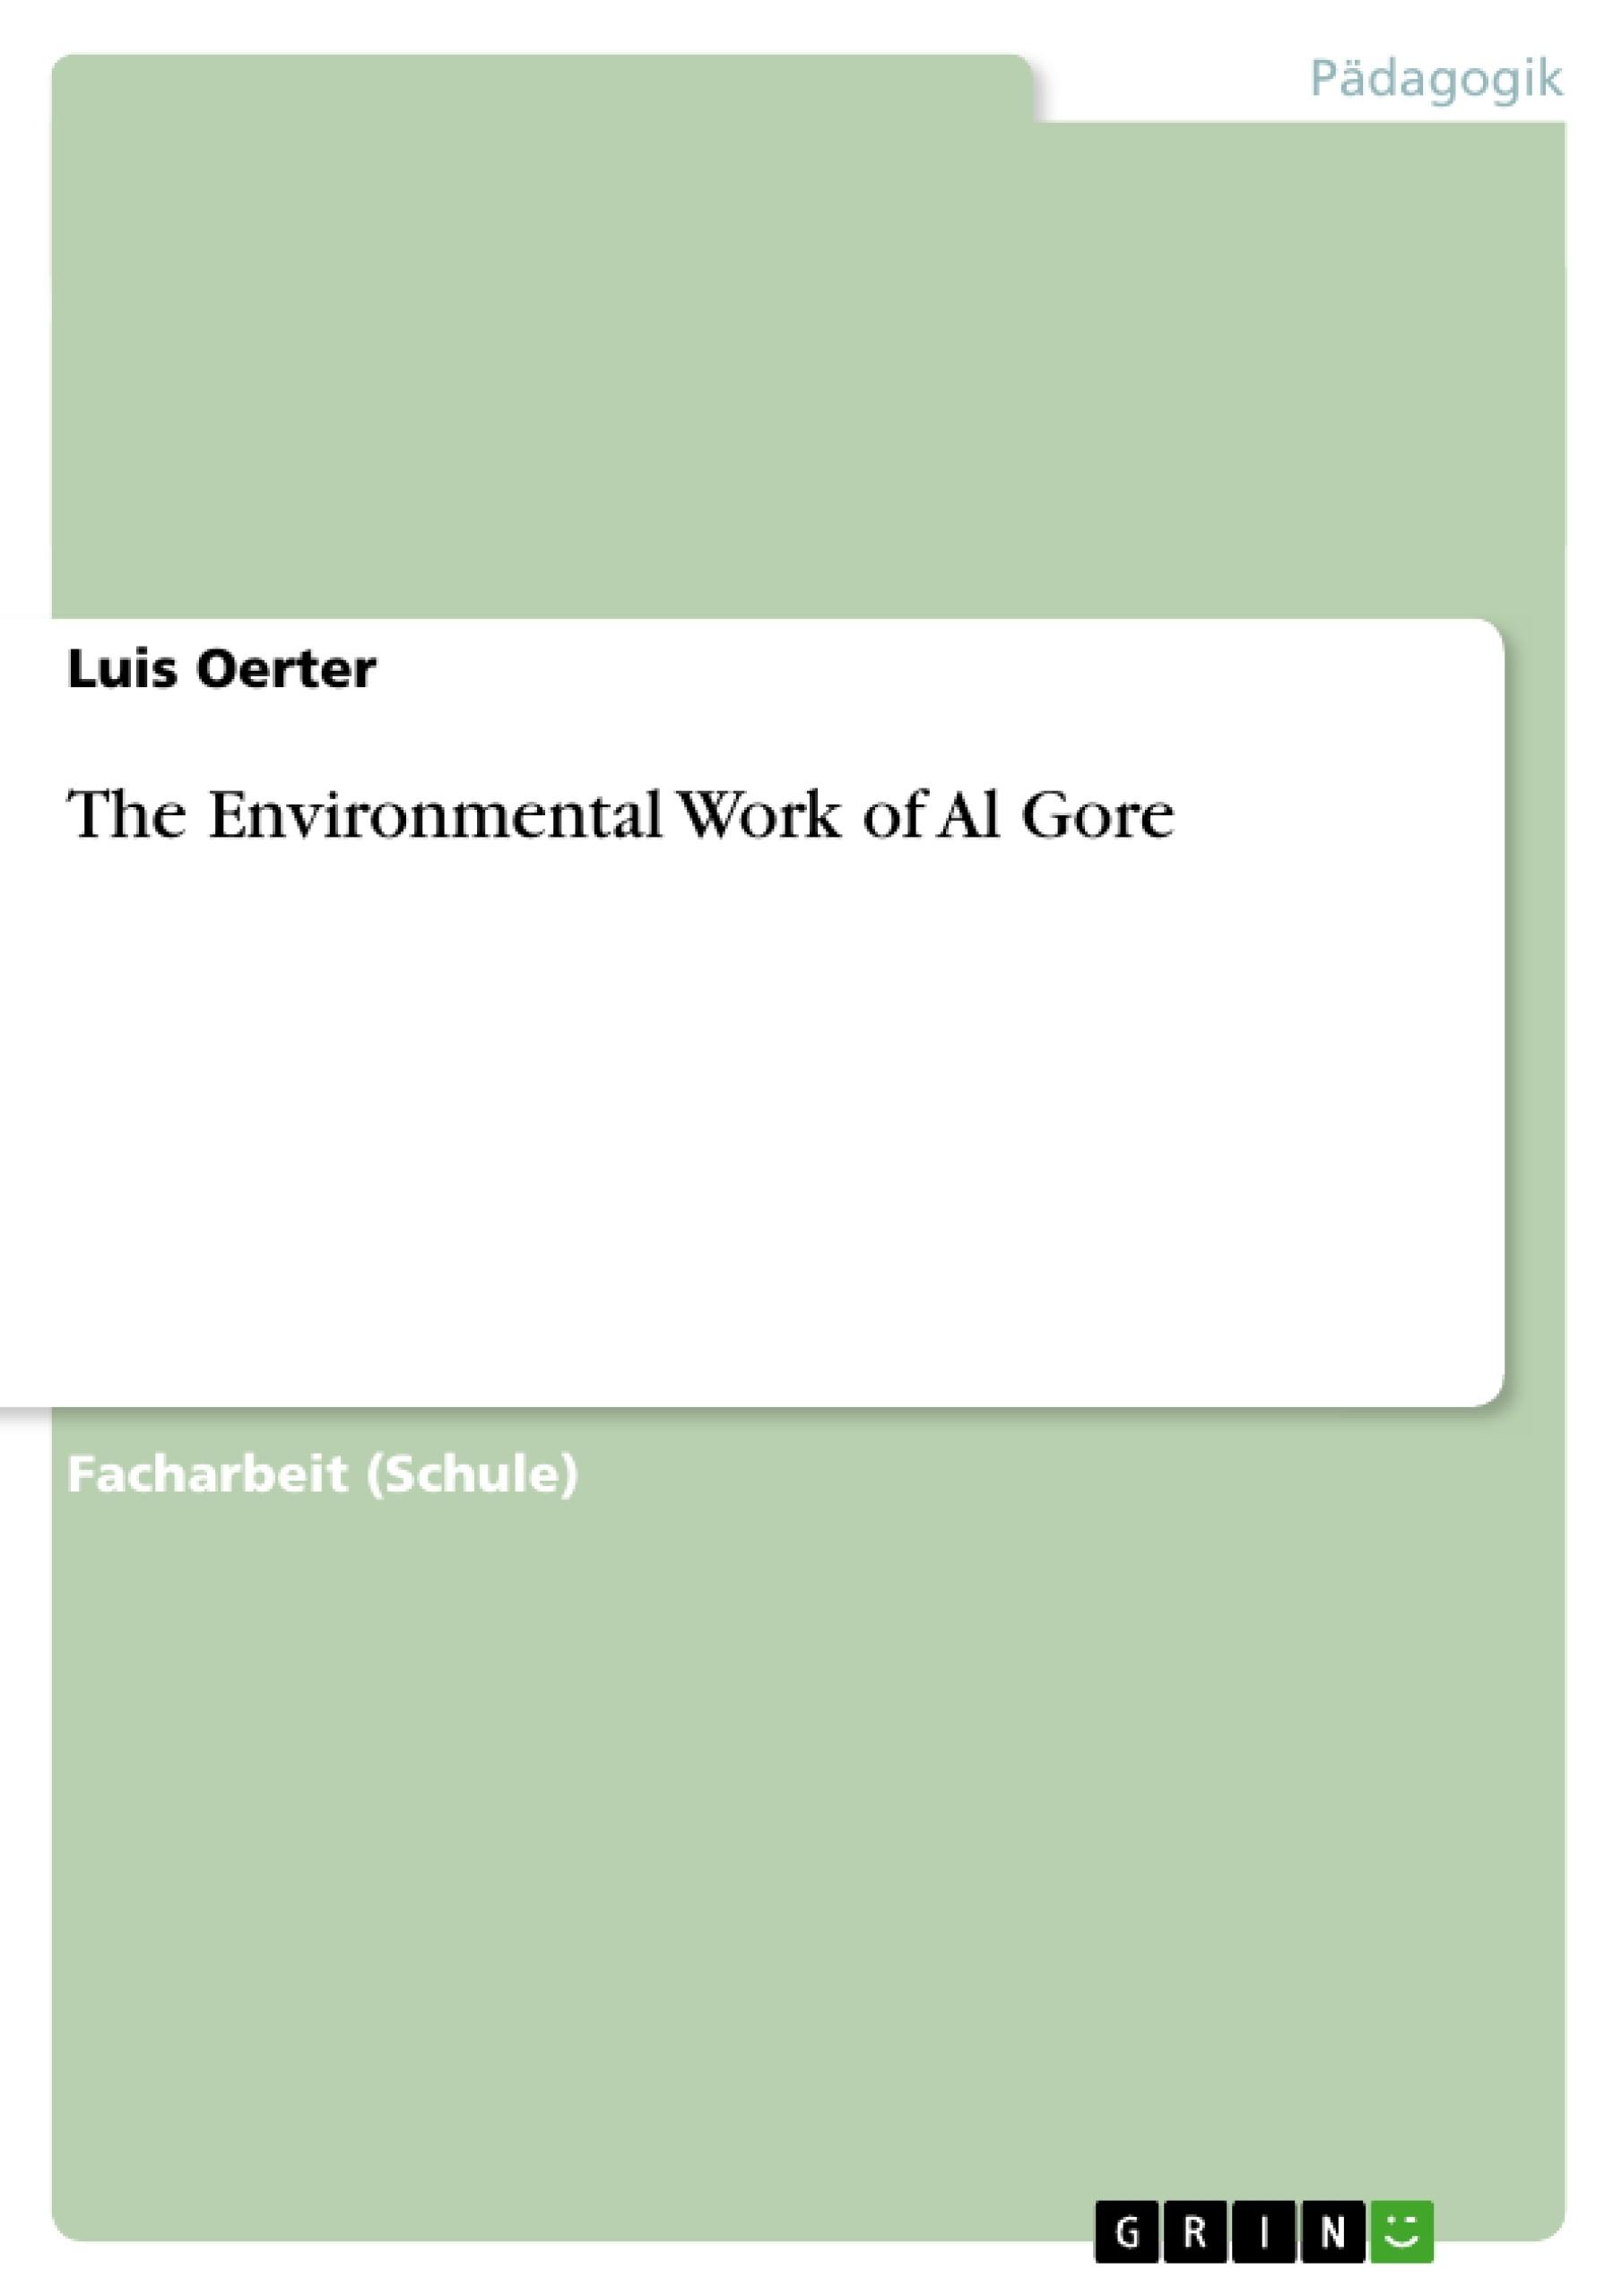 Titel: The Environmental Work of Al Gore